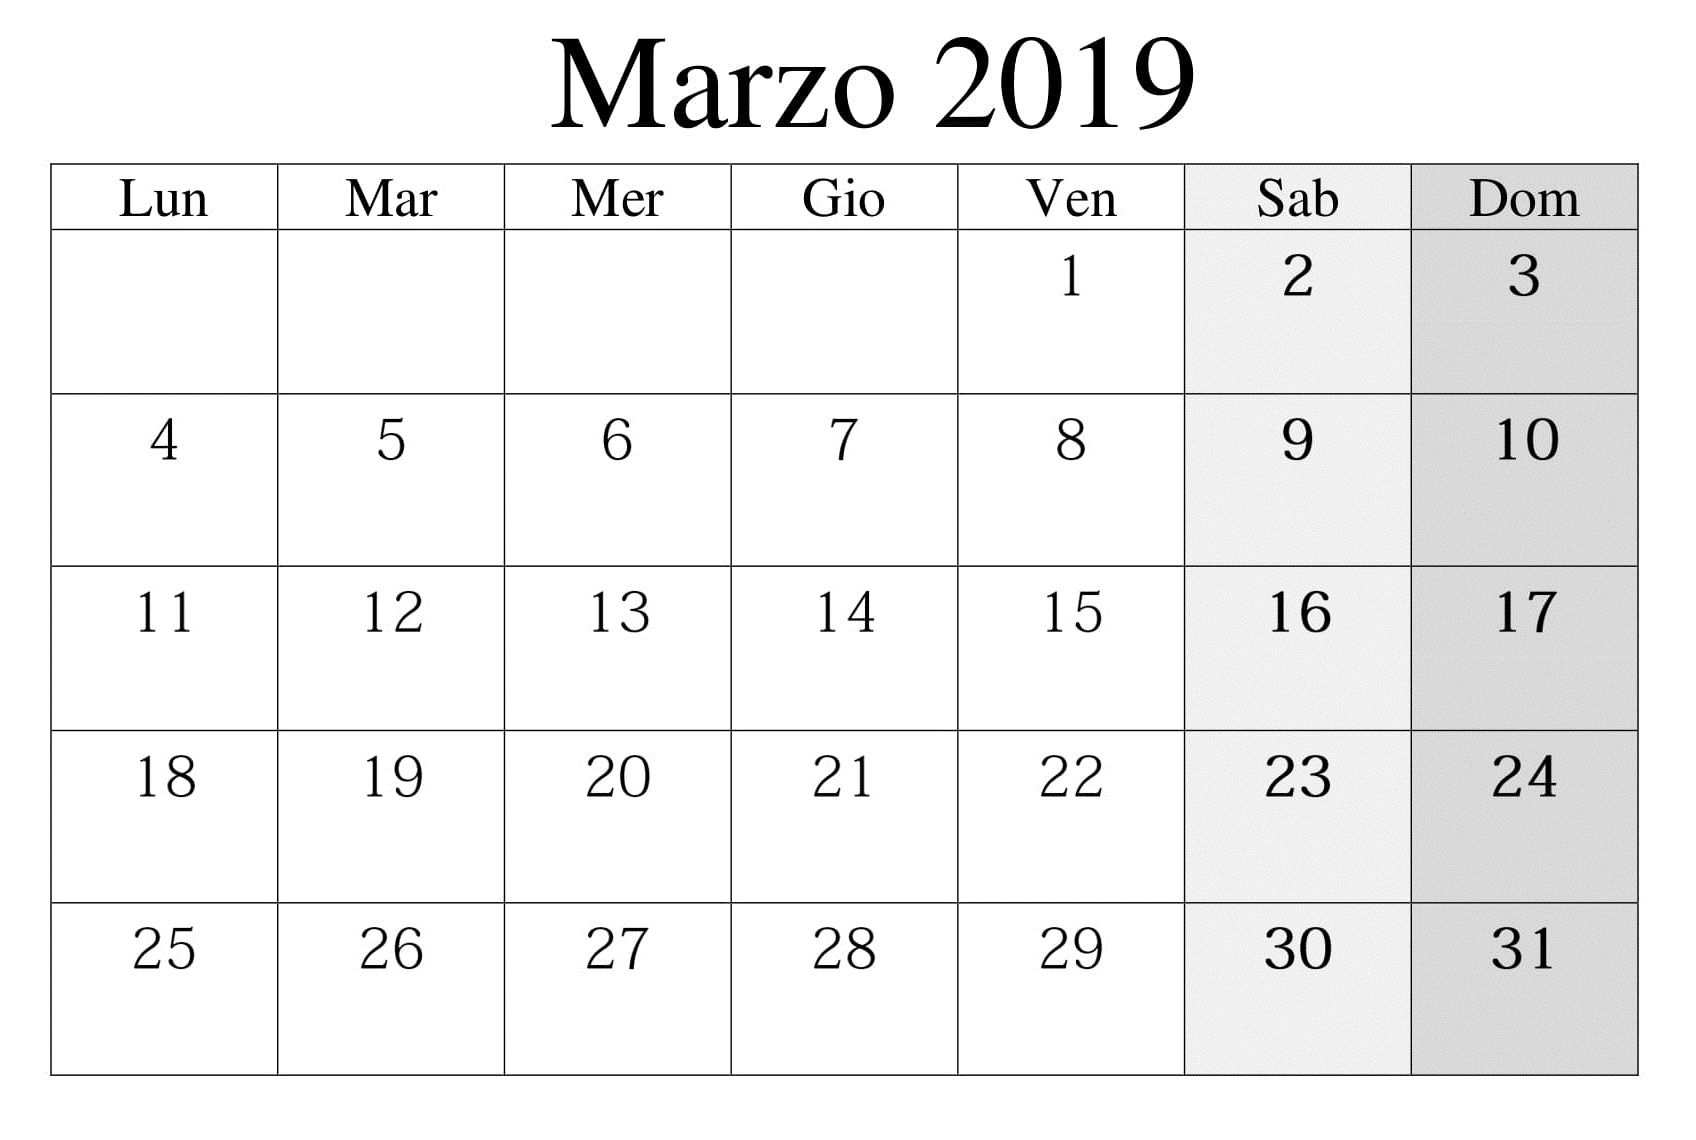 Calendario Appunti Da Stampare.Calendario Marzo 2019 Da Stampare Calendario Marzo 2019 Da